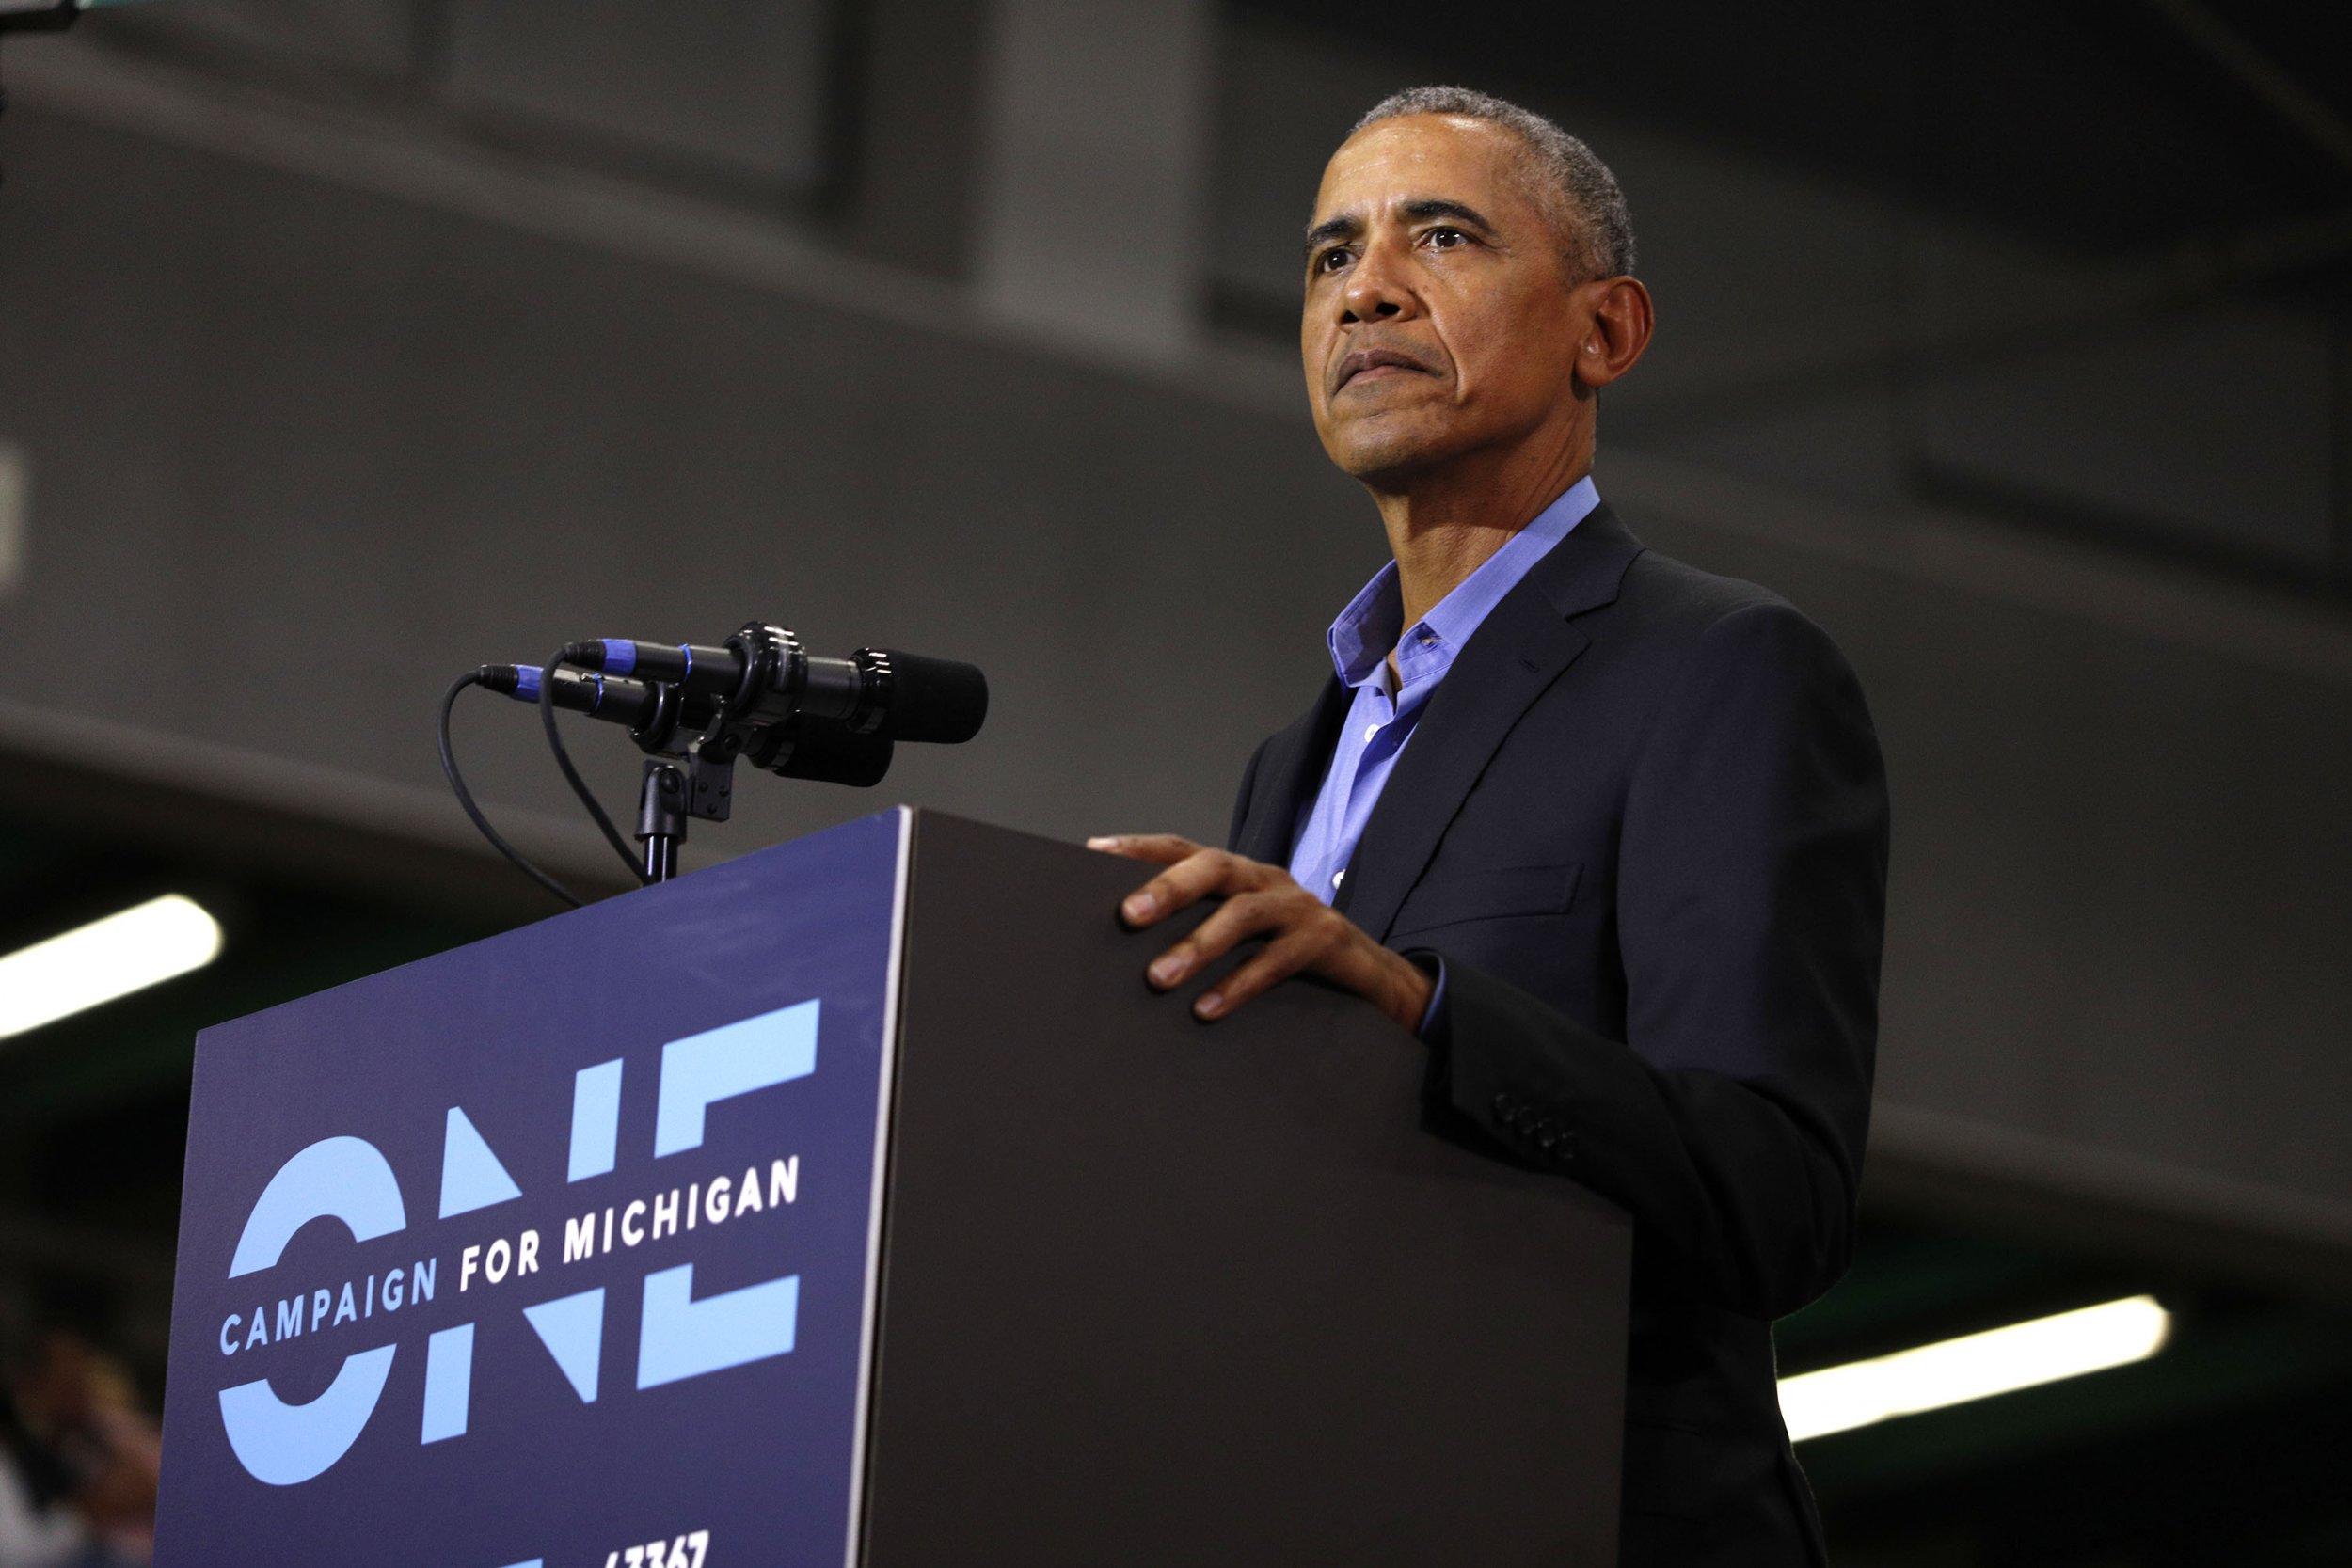 barack obama, donald trump rallies watch live stream